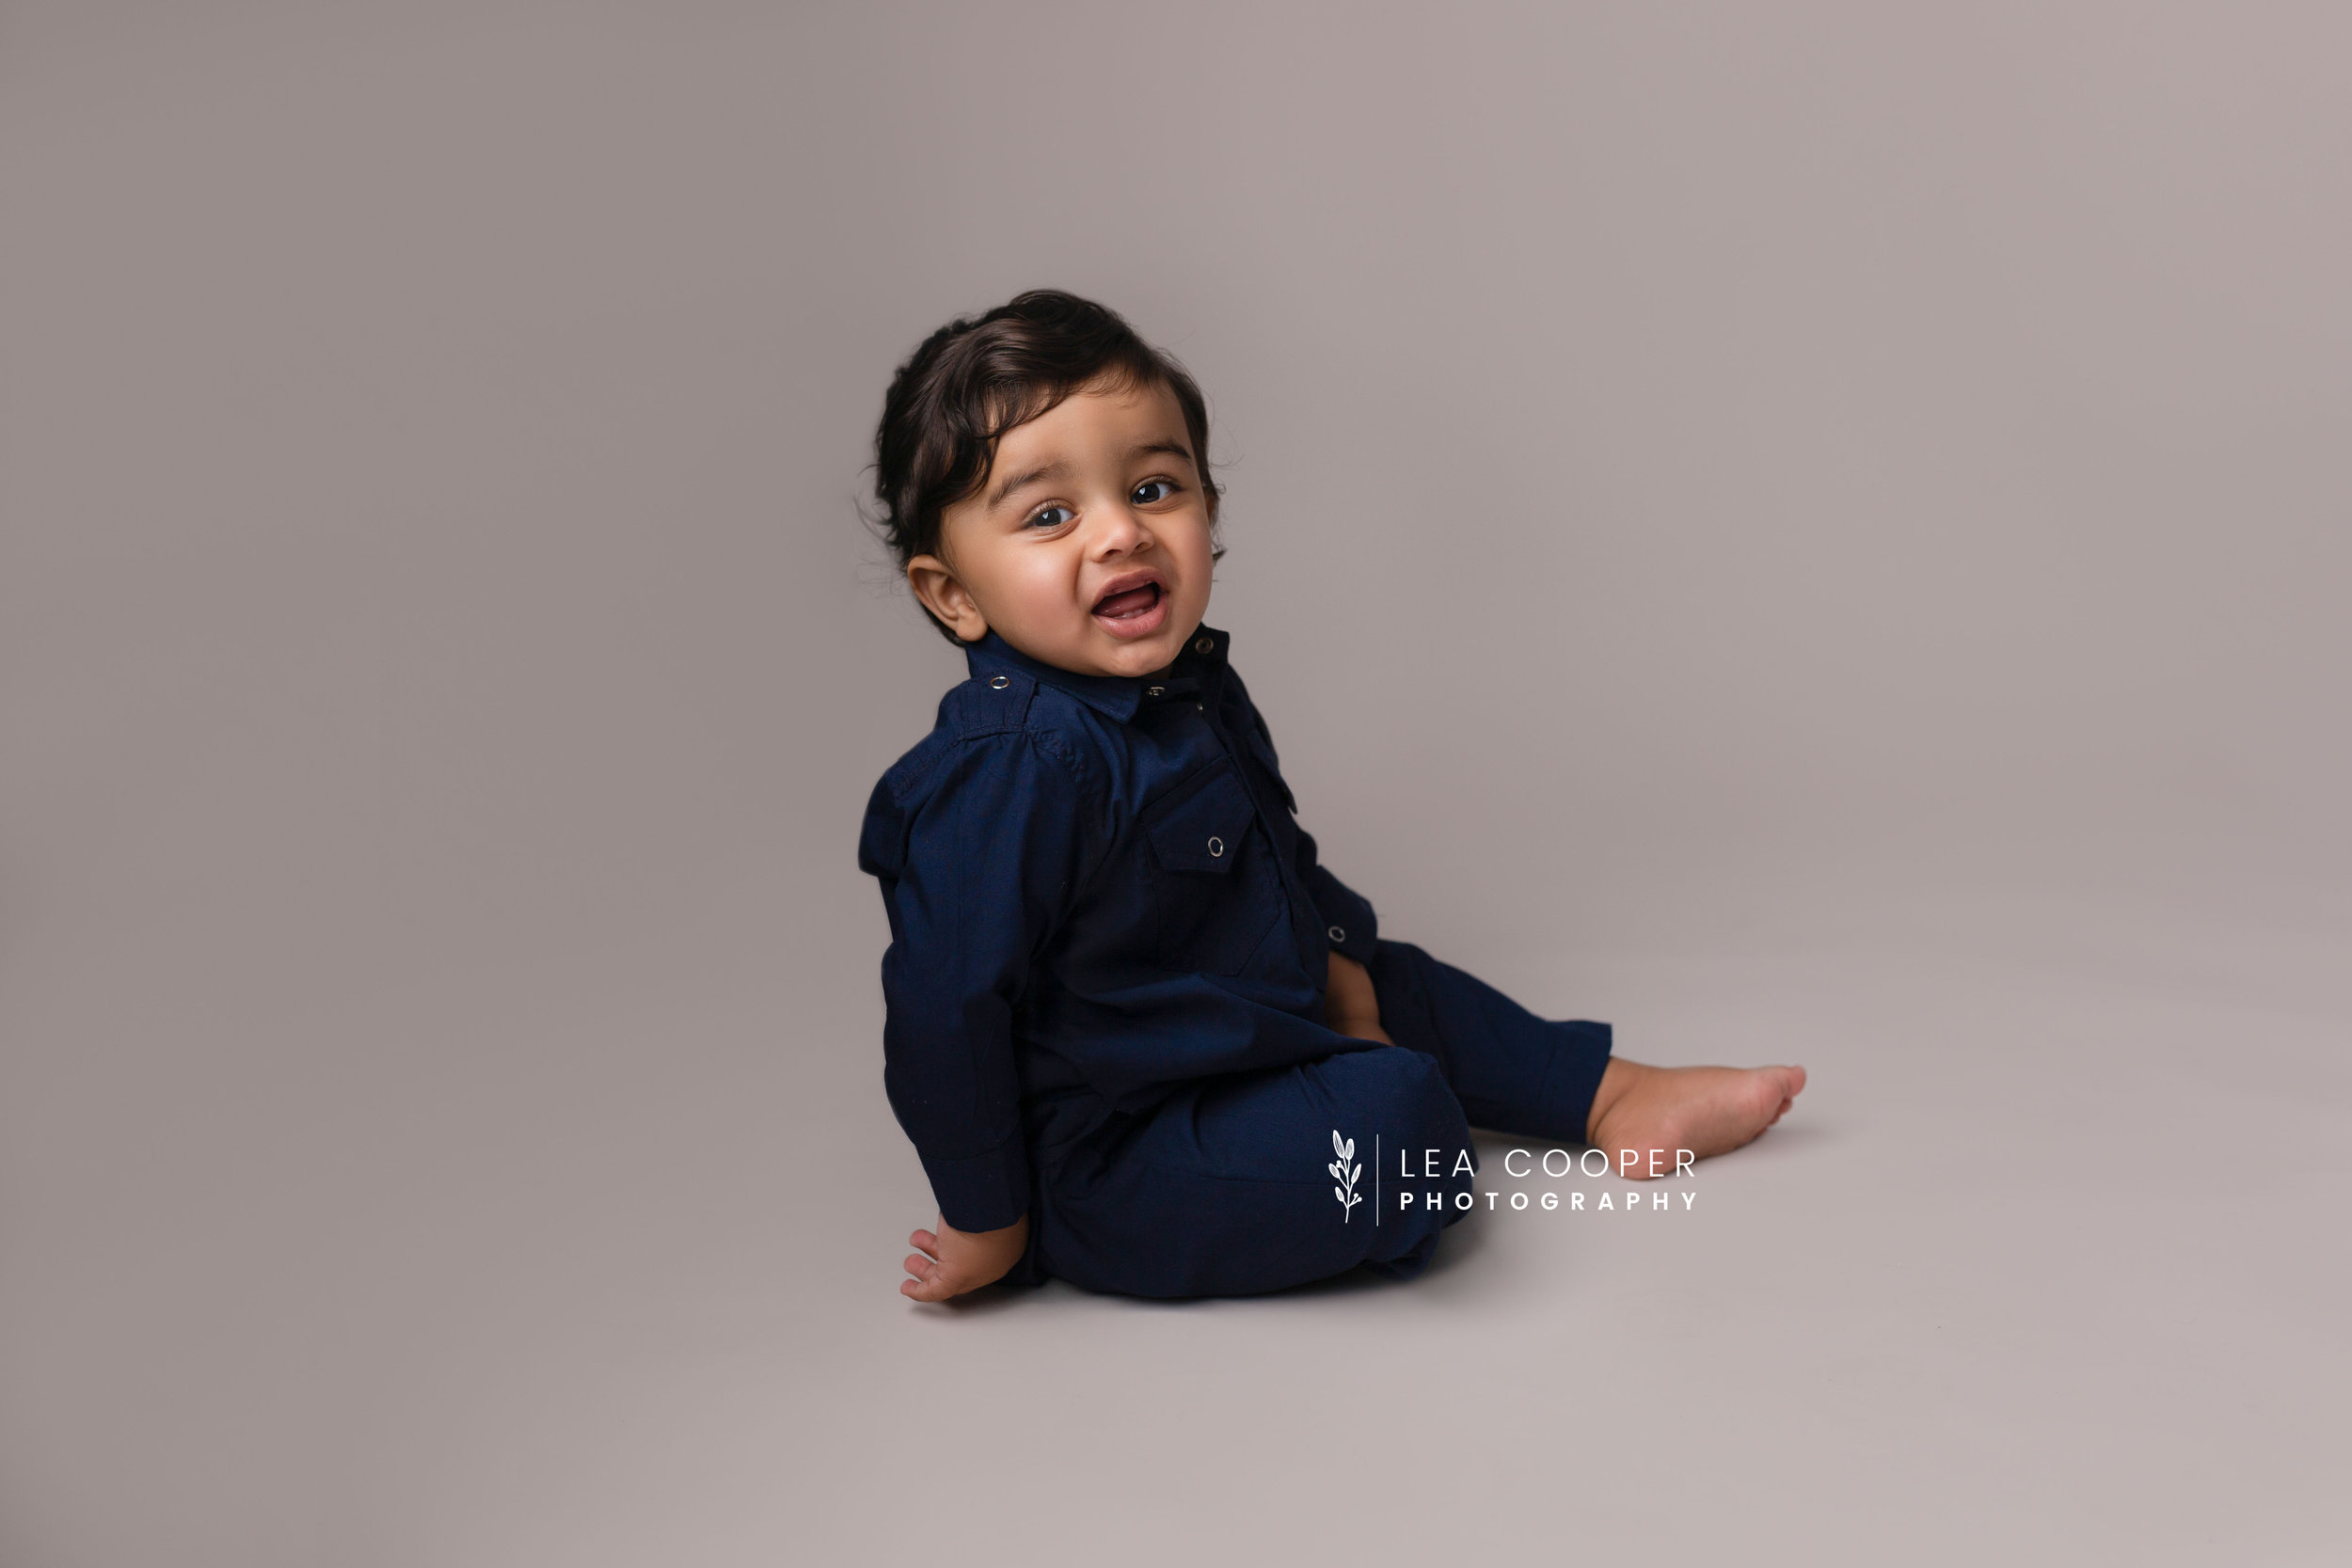 LEA-COOPER-PHOTOGRAPHY-CAKE-SMASH-PHOTOGRAPHER-WILLENALL-WOLVERHAMPTON-CHILD-PHOTOSHOOT-1ST—BIRTHDAY-PICTURES-WEDNESBURY-WALSALL-DUDLEY-WEST-MIDLANDS-UK-5.JPG